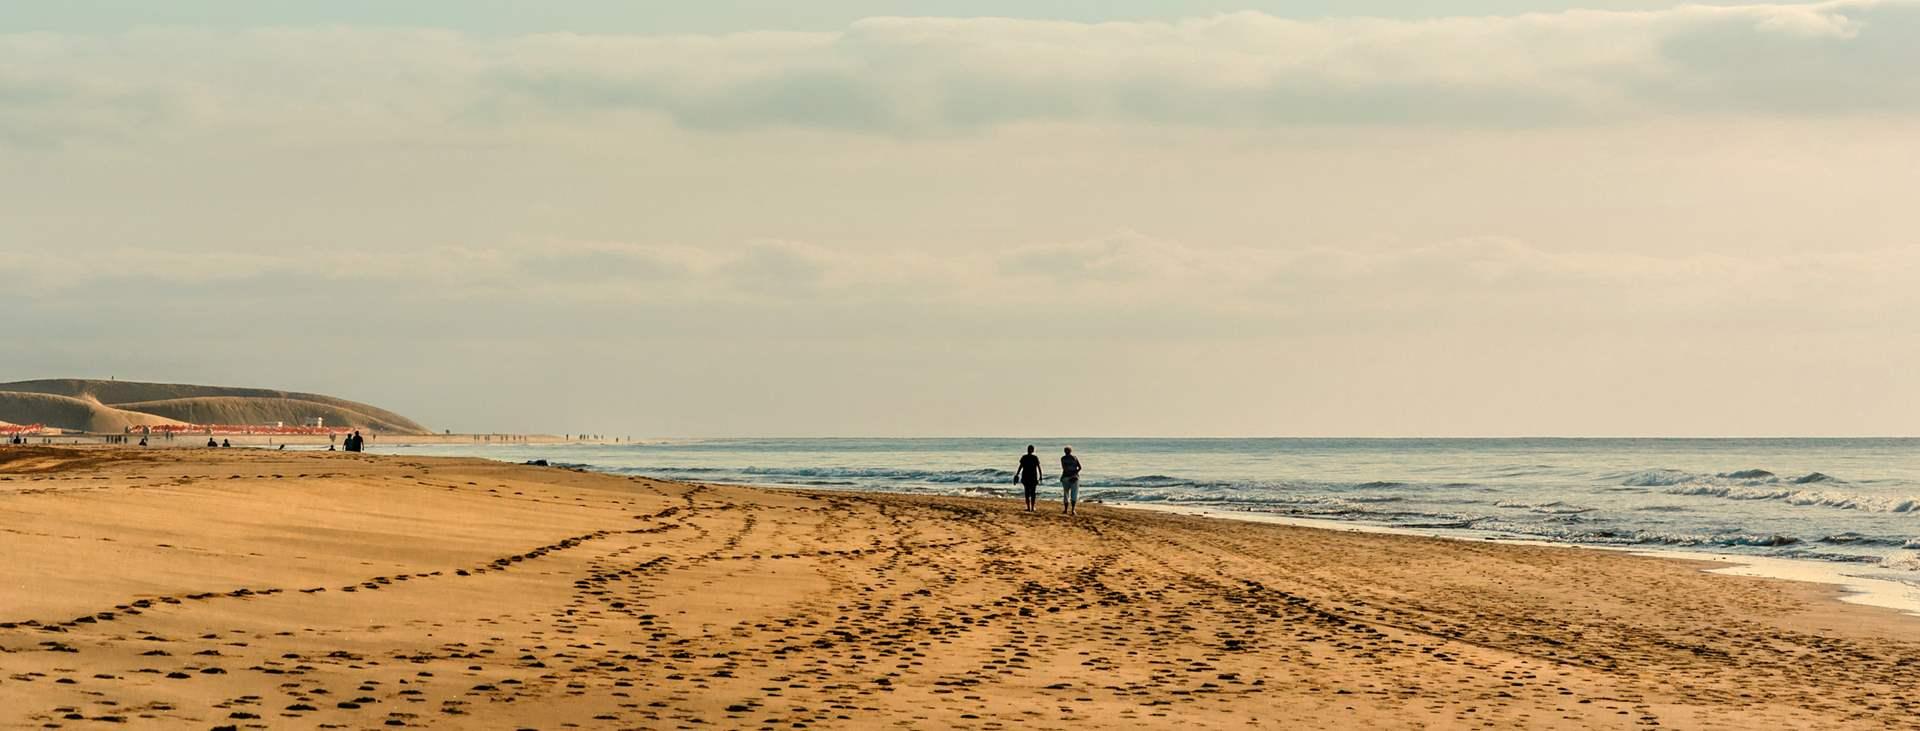 Vietä Tjäreborgin loma Playa del Inglésissä Gran Canarialla